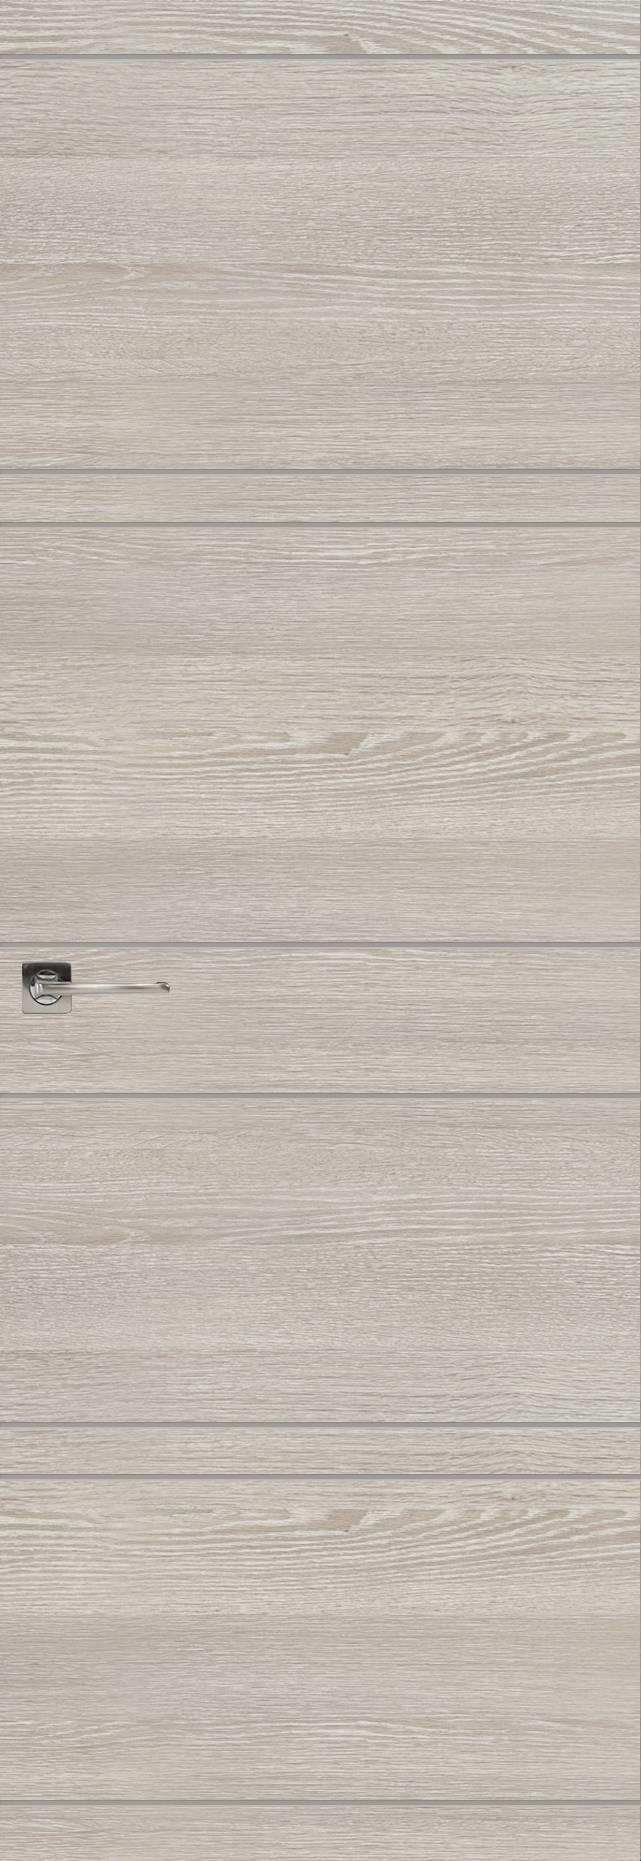 Tivoli Е-2 Невидимка цвет - Серый дуб Без стекла (ДГ)